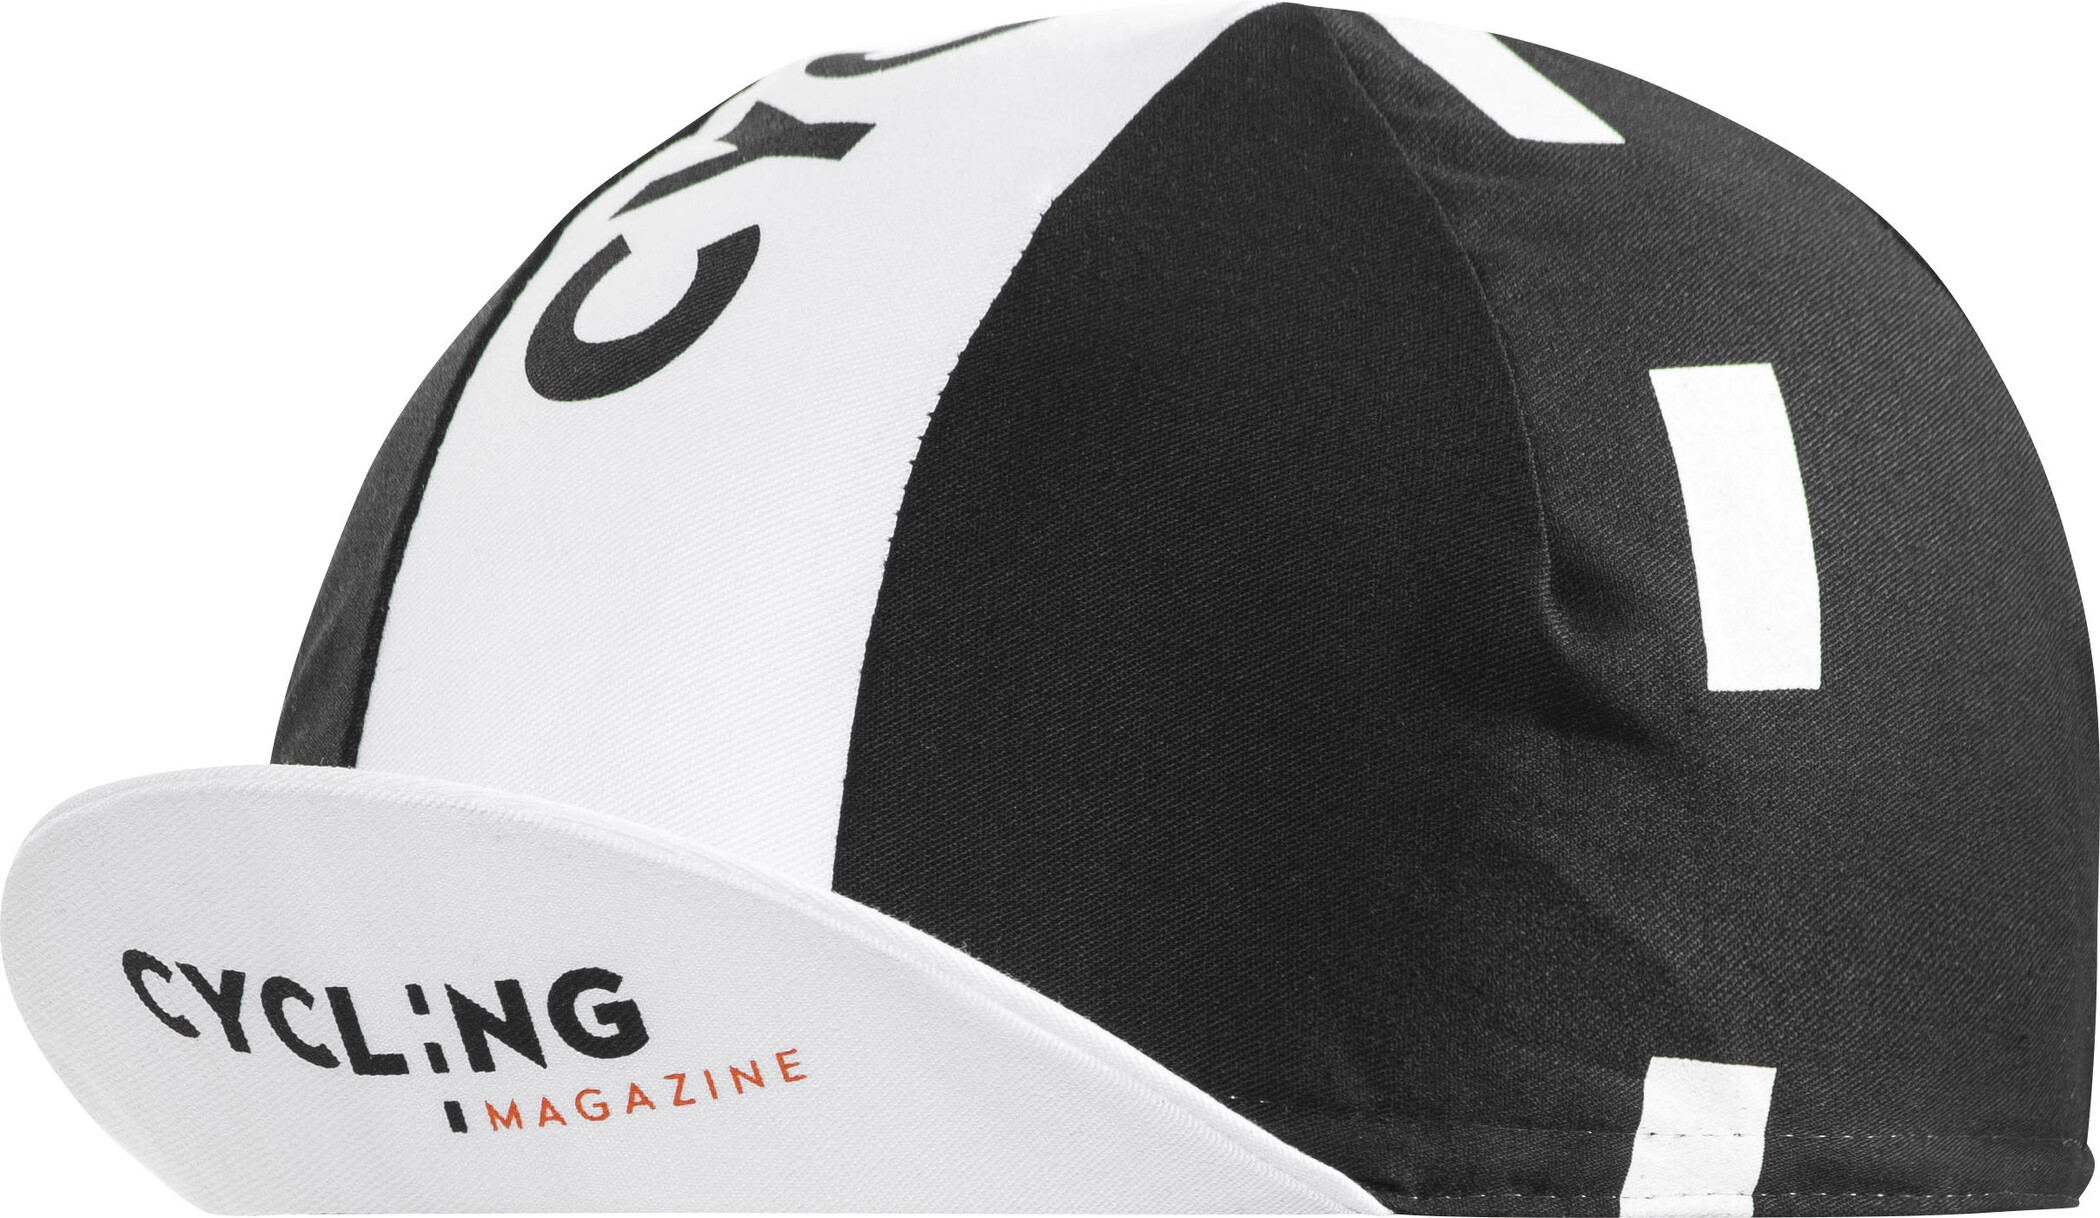 CYCLING MAGAZINE Race Hovedbeklædning Herrer, black (2019) | Headwear